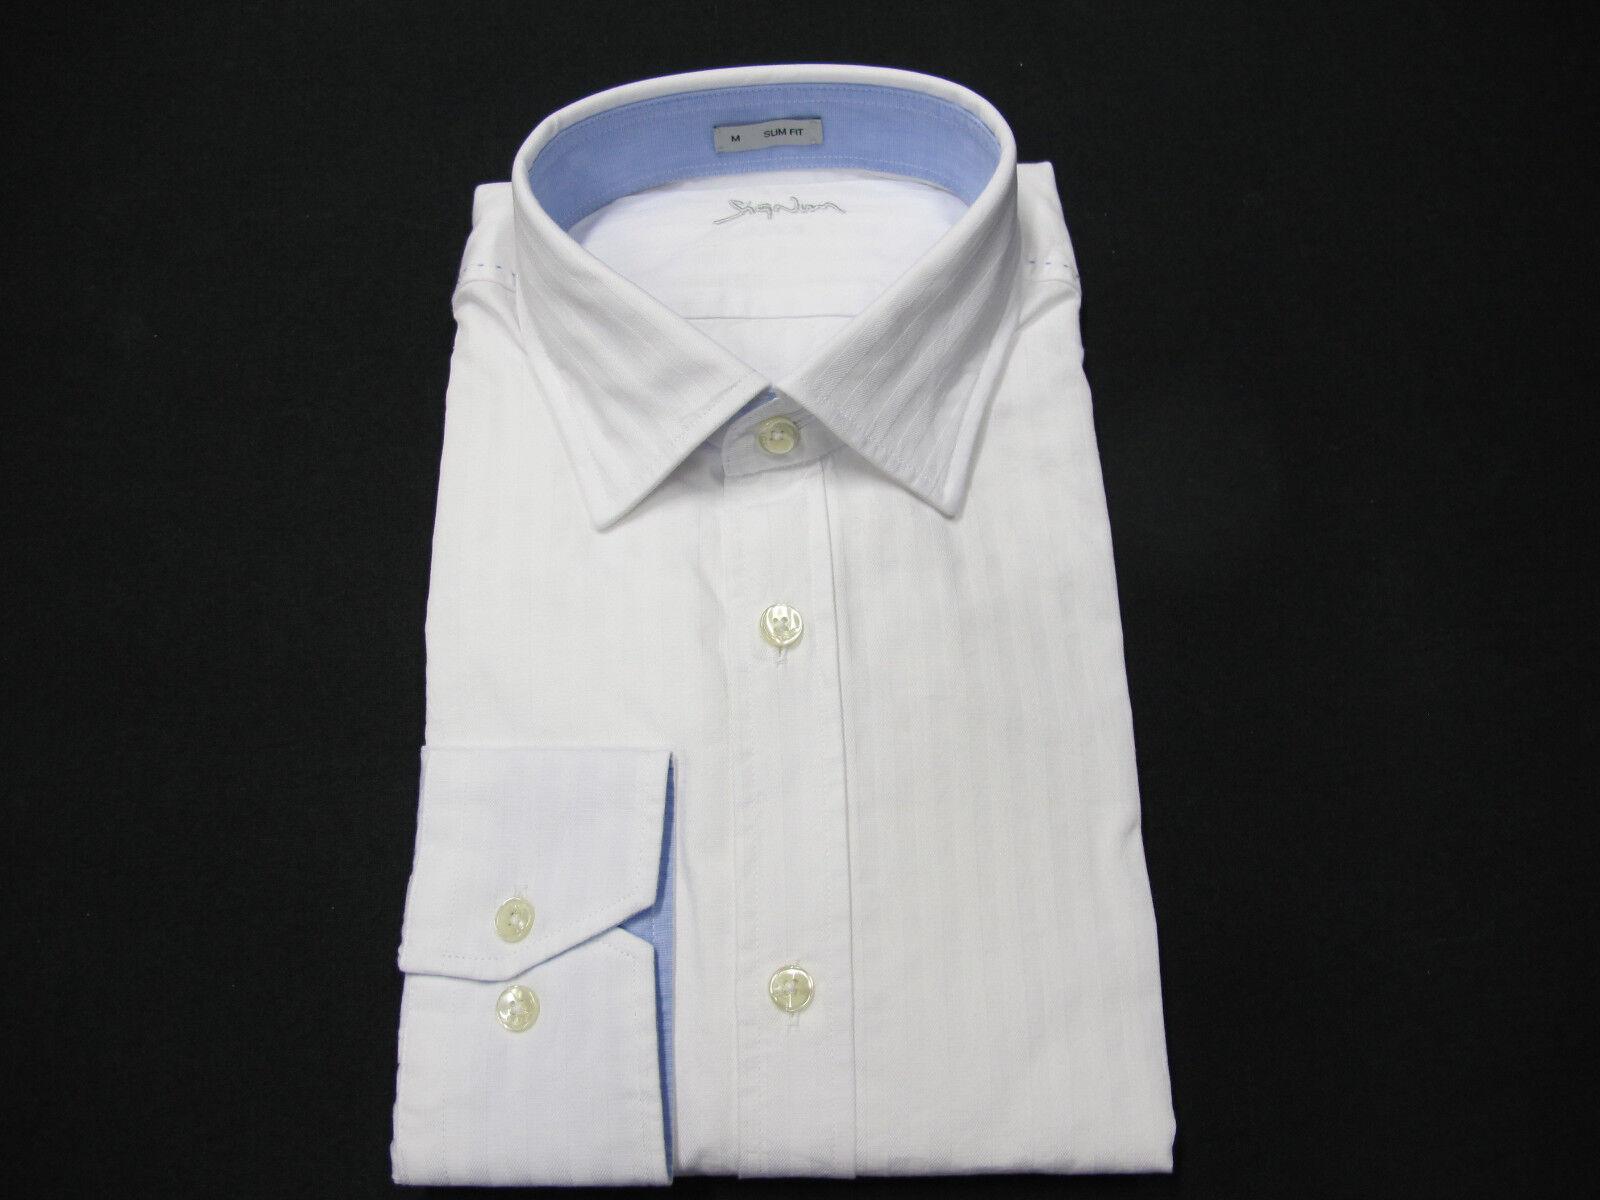 Signum Hemden Langarm Gr. M, L, XL, weiß uni